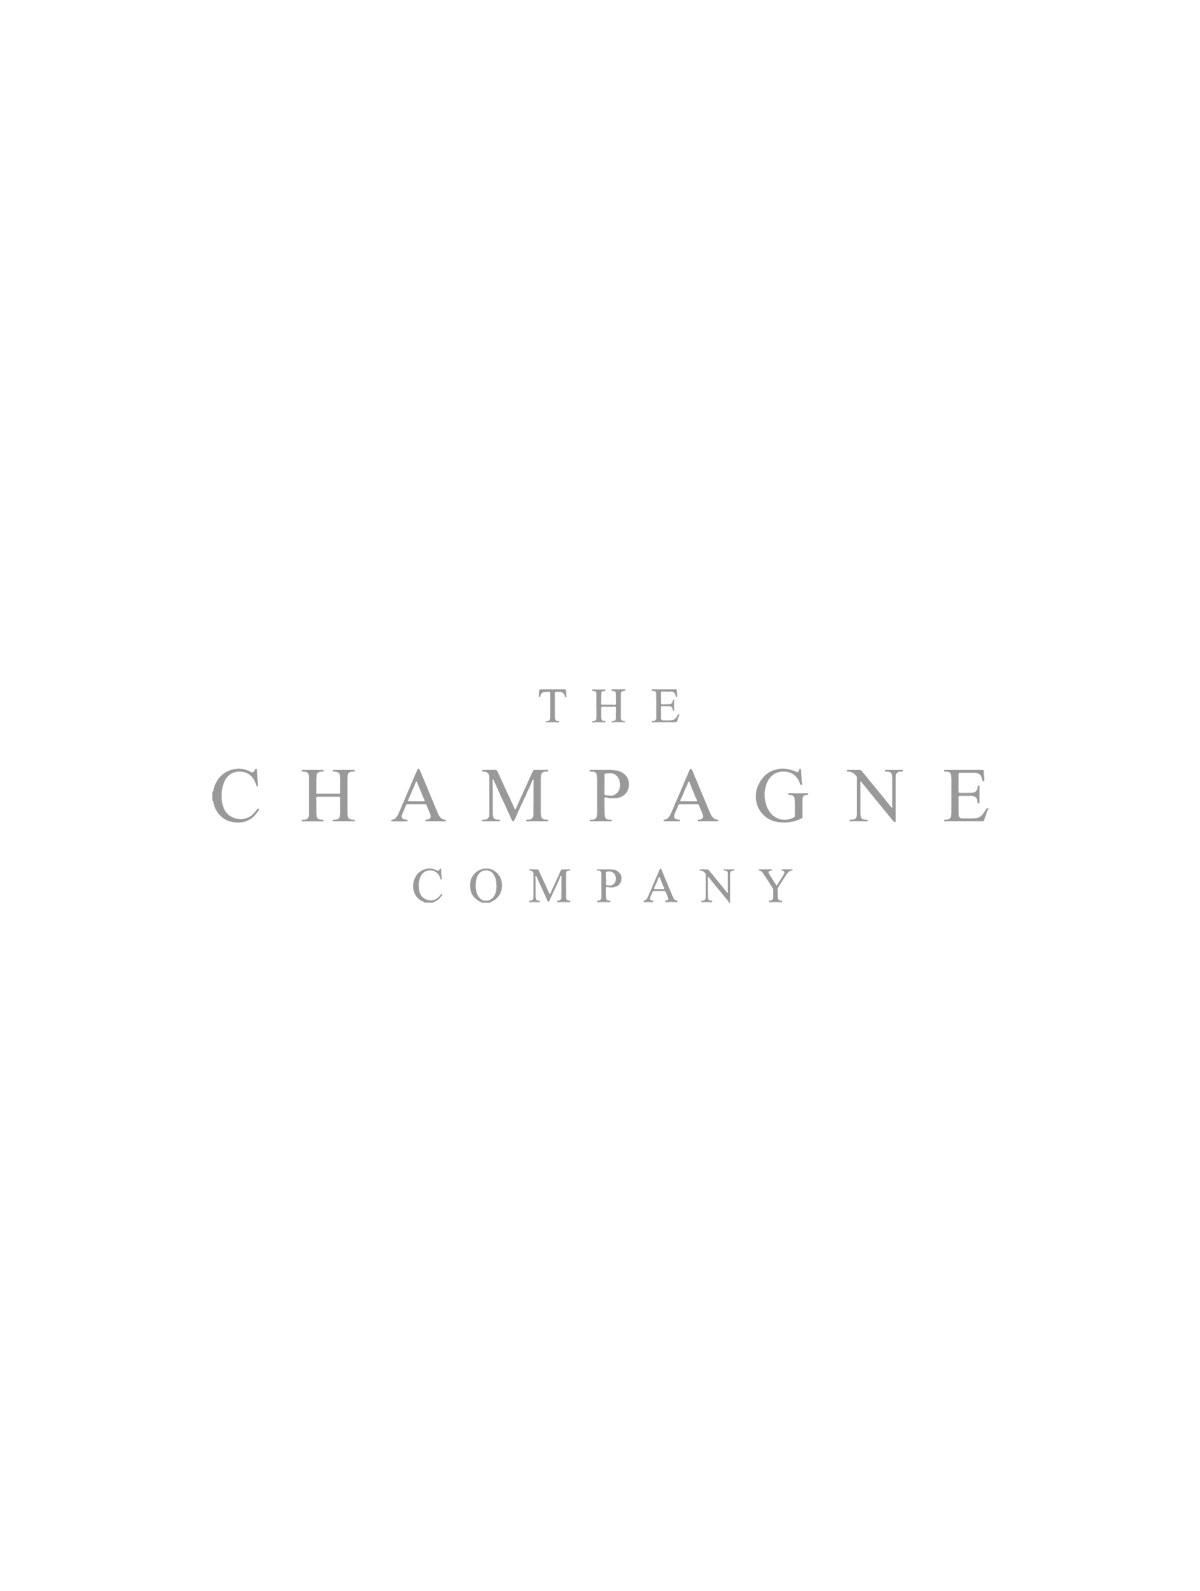 Thienot Cuvee Stanislas Blanc 2005 Champagne Vintage 75cl